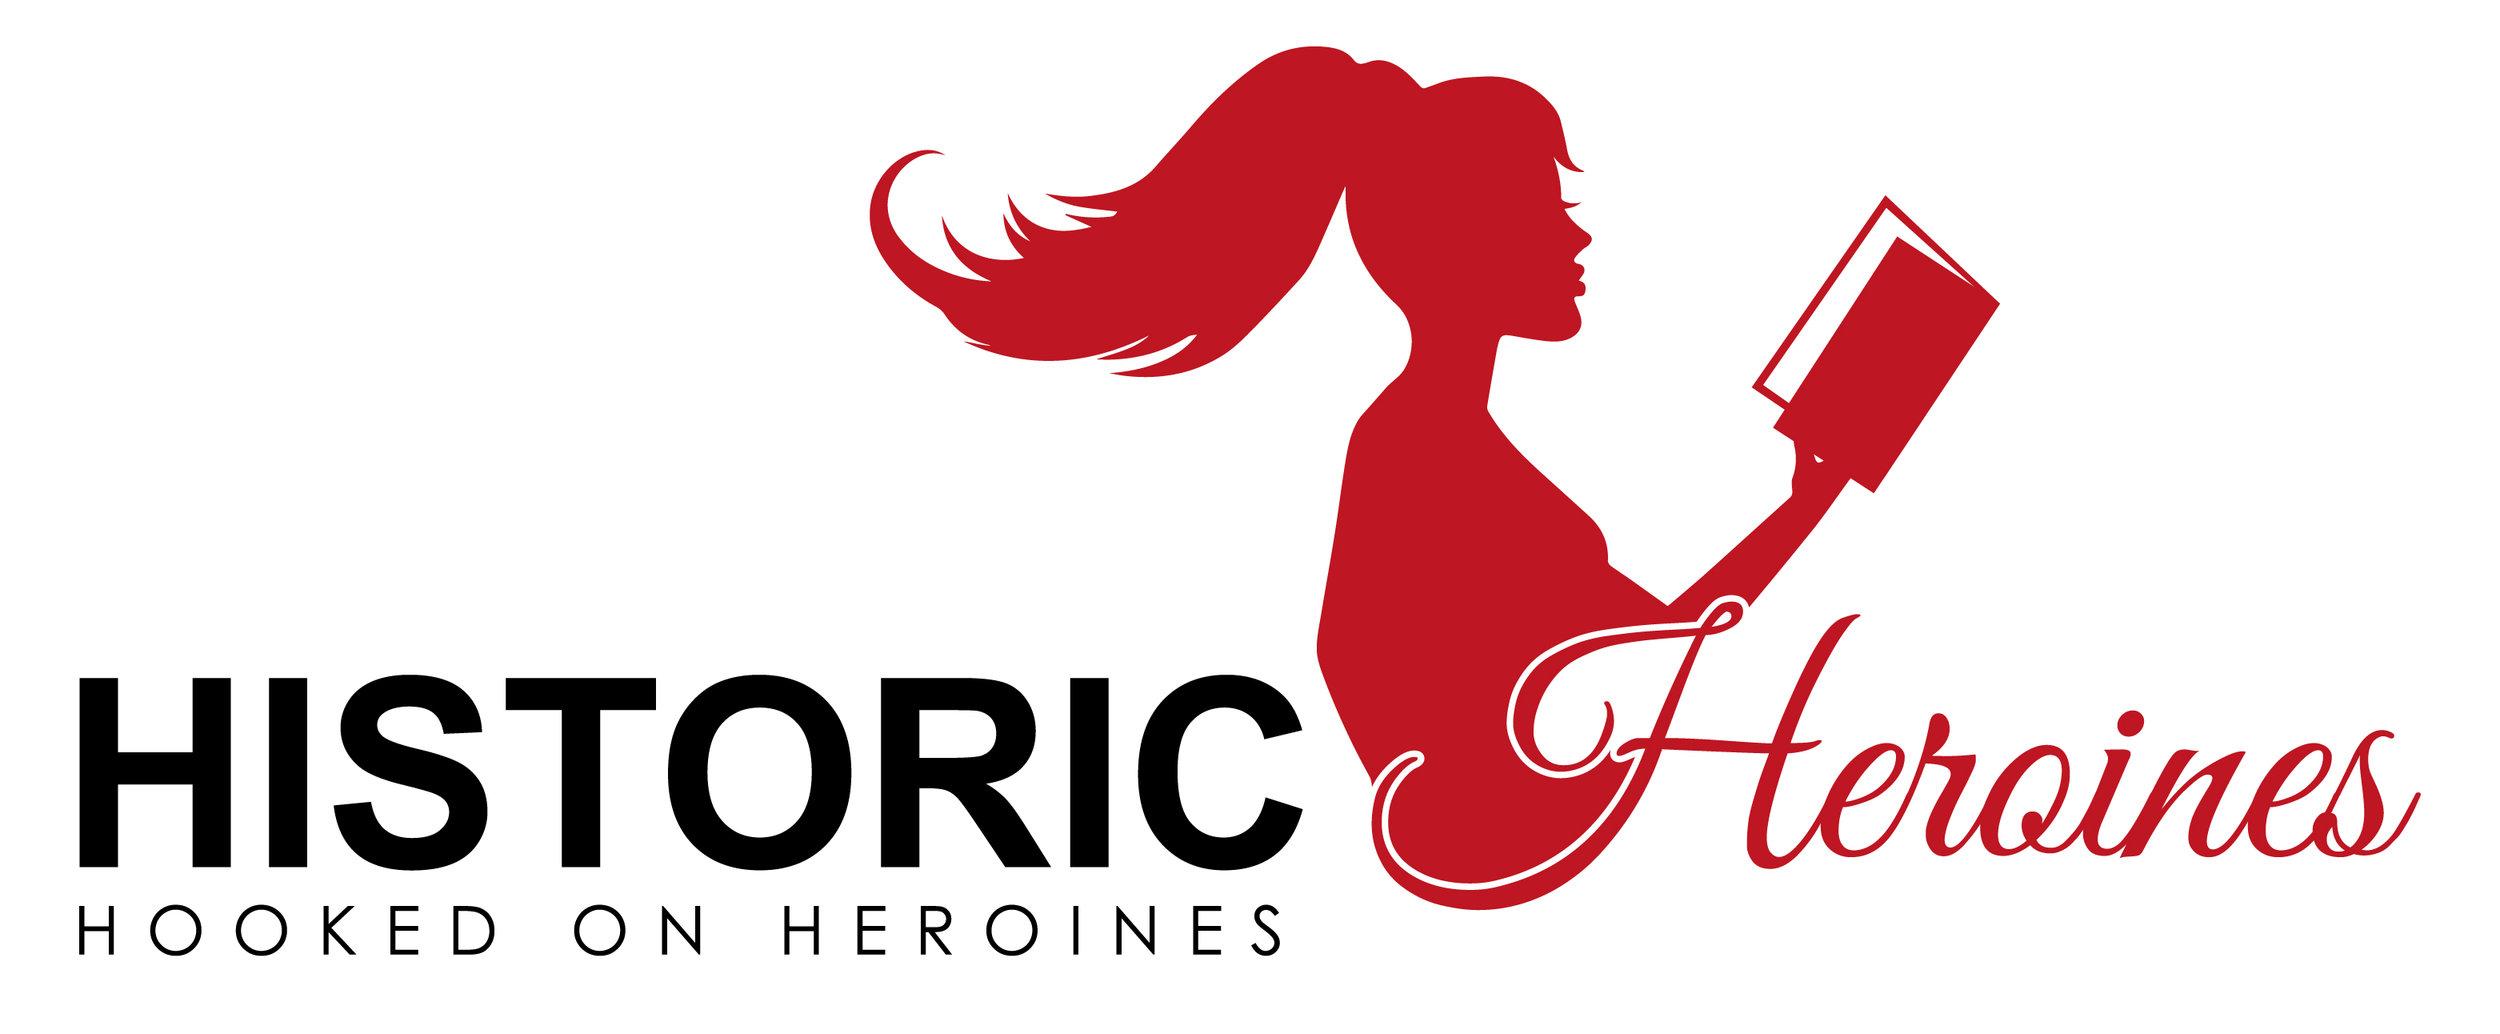 Historic Heroines- JPEG-01.jpg